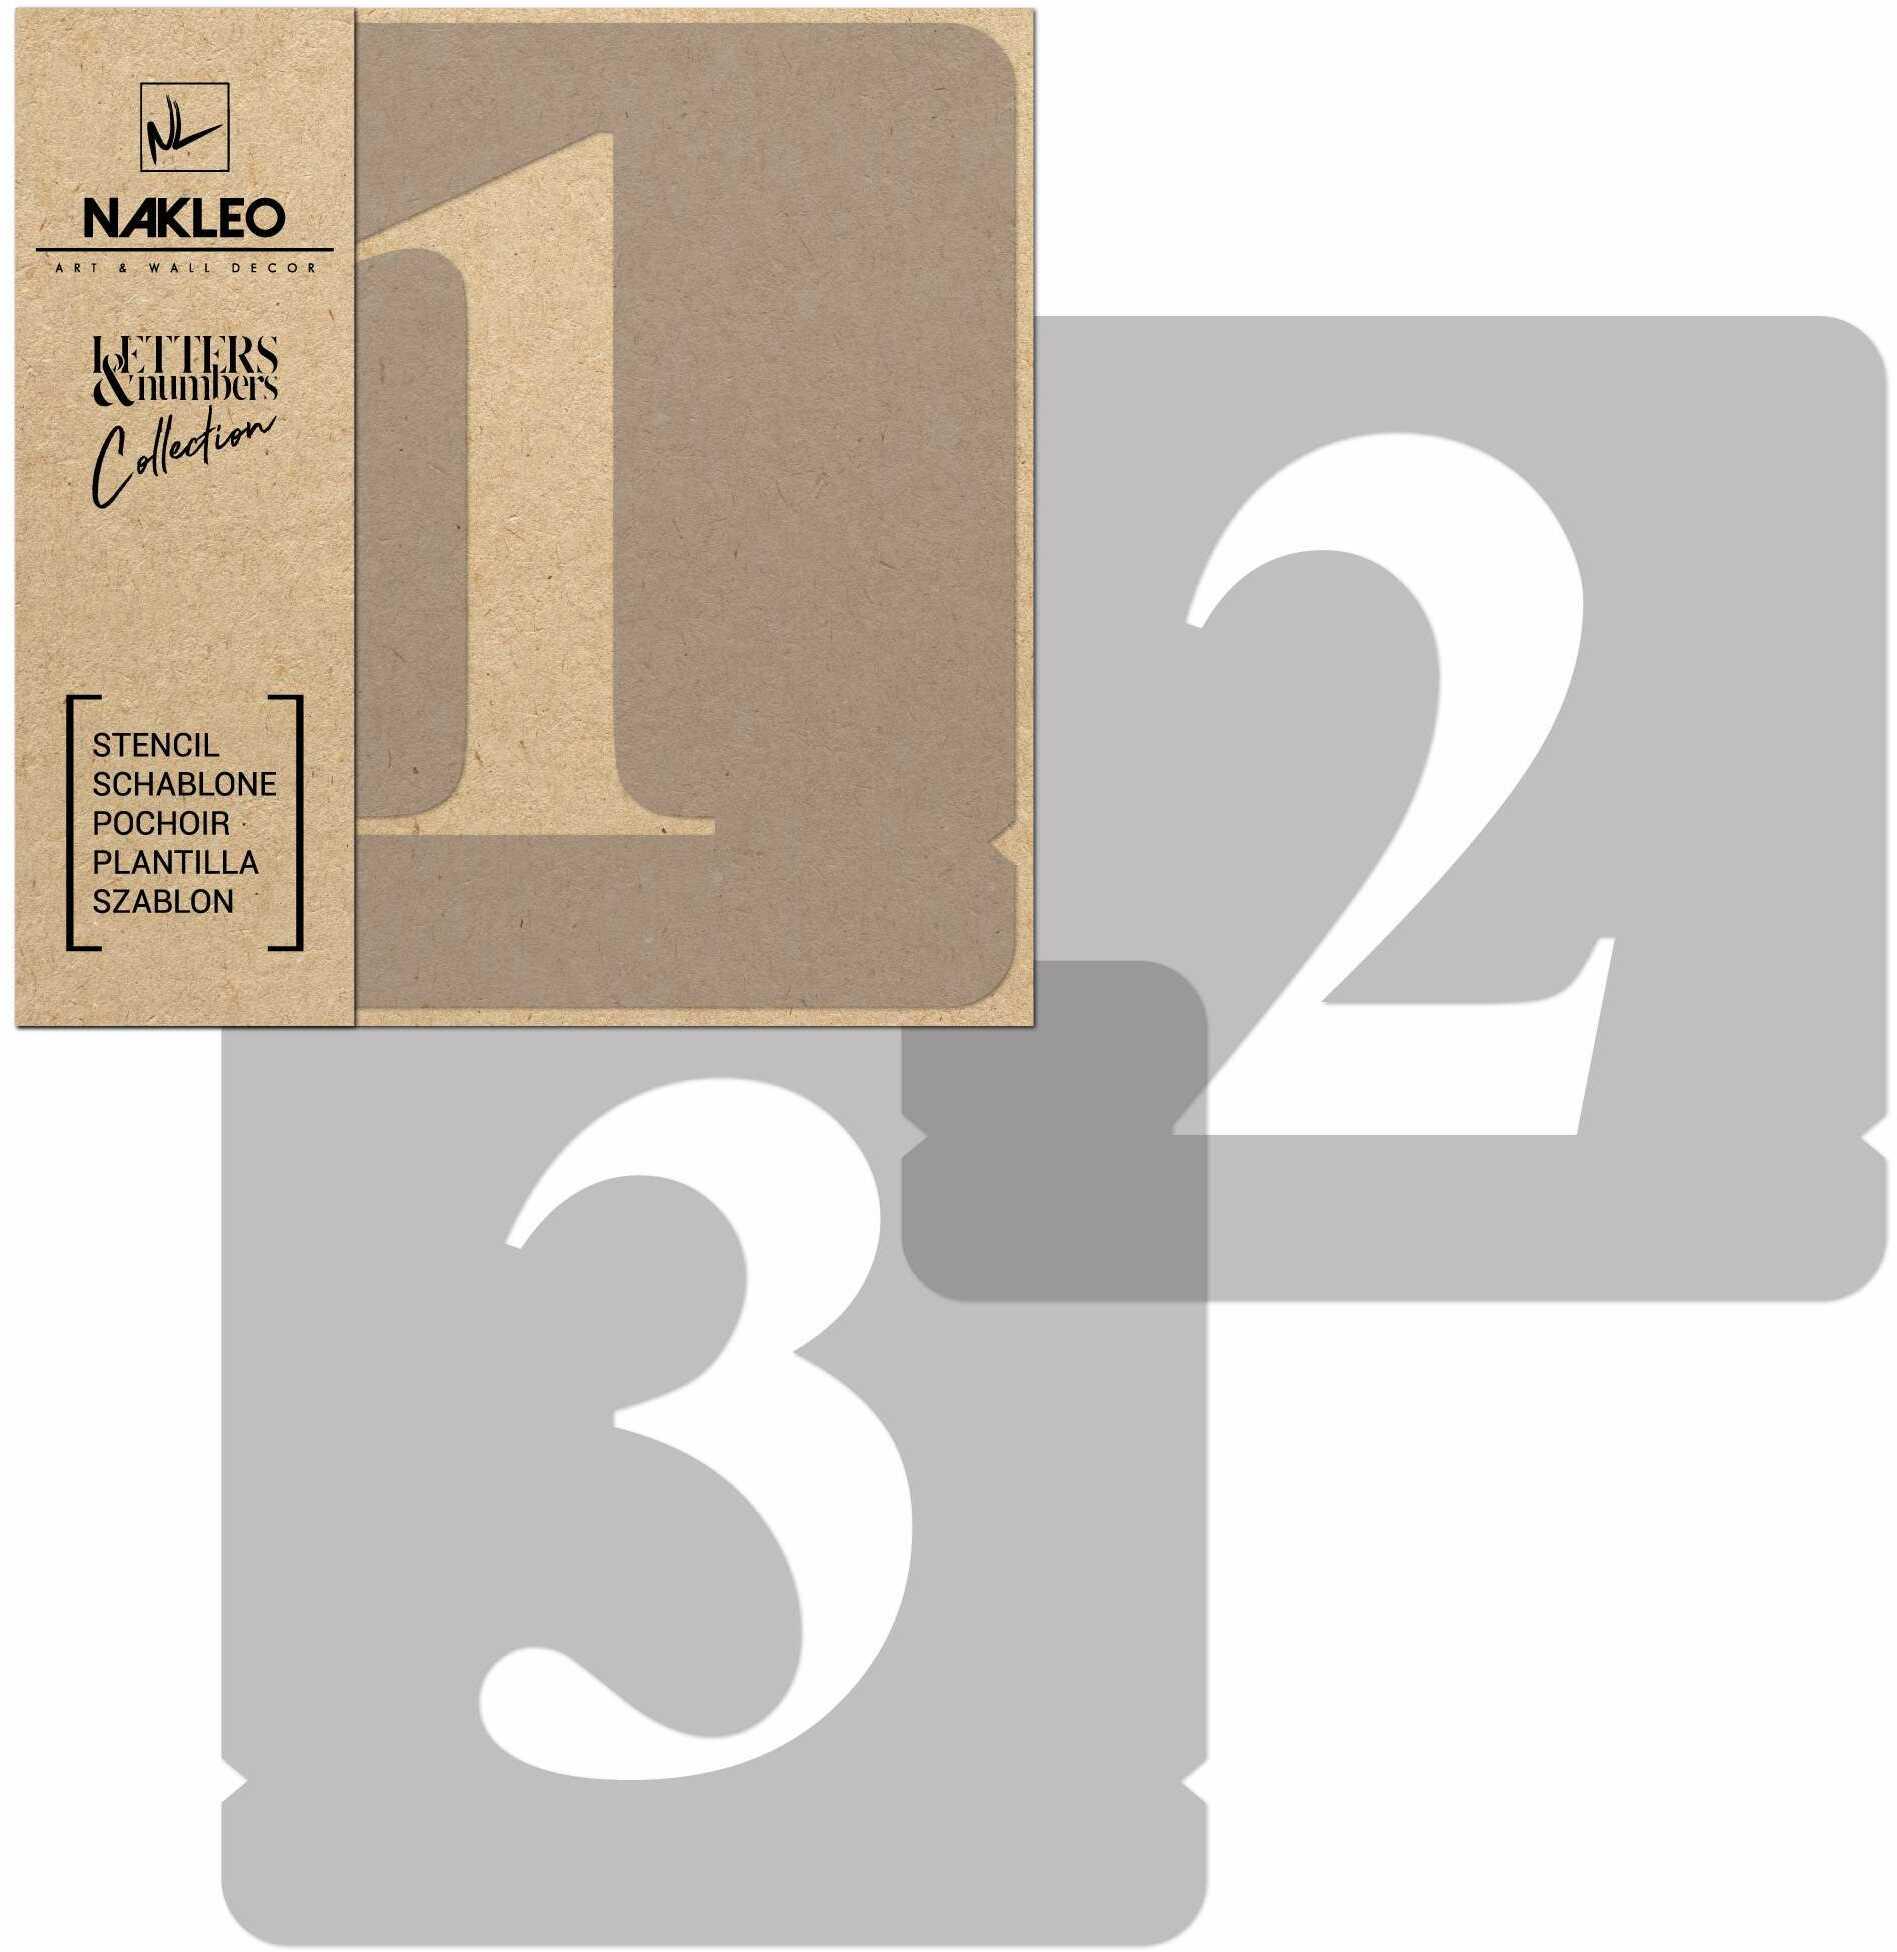 szablon malarski wielokrotny // cyfry 250 mm // Times Roman Cyfry